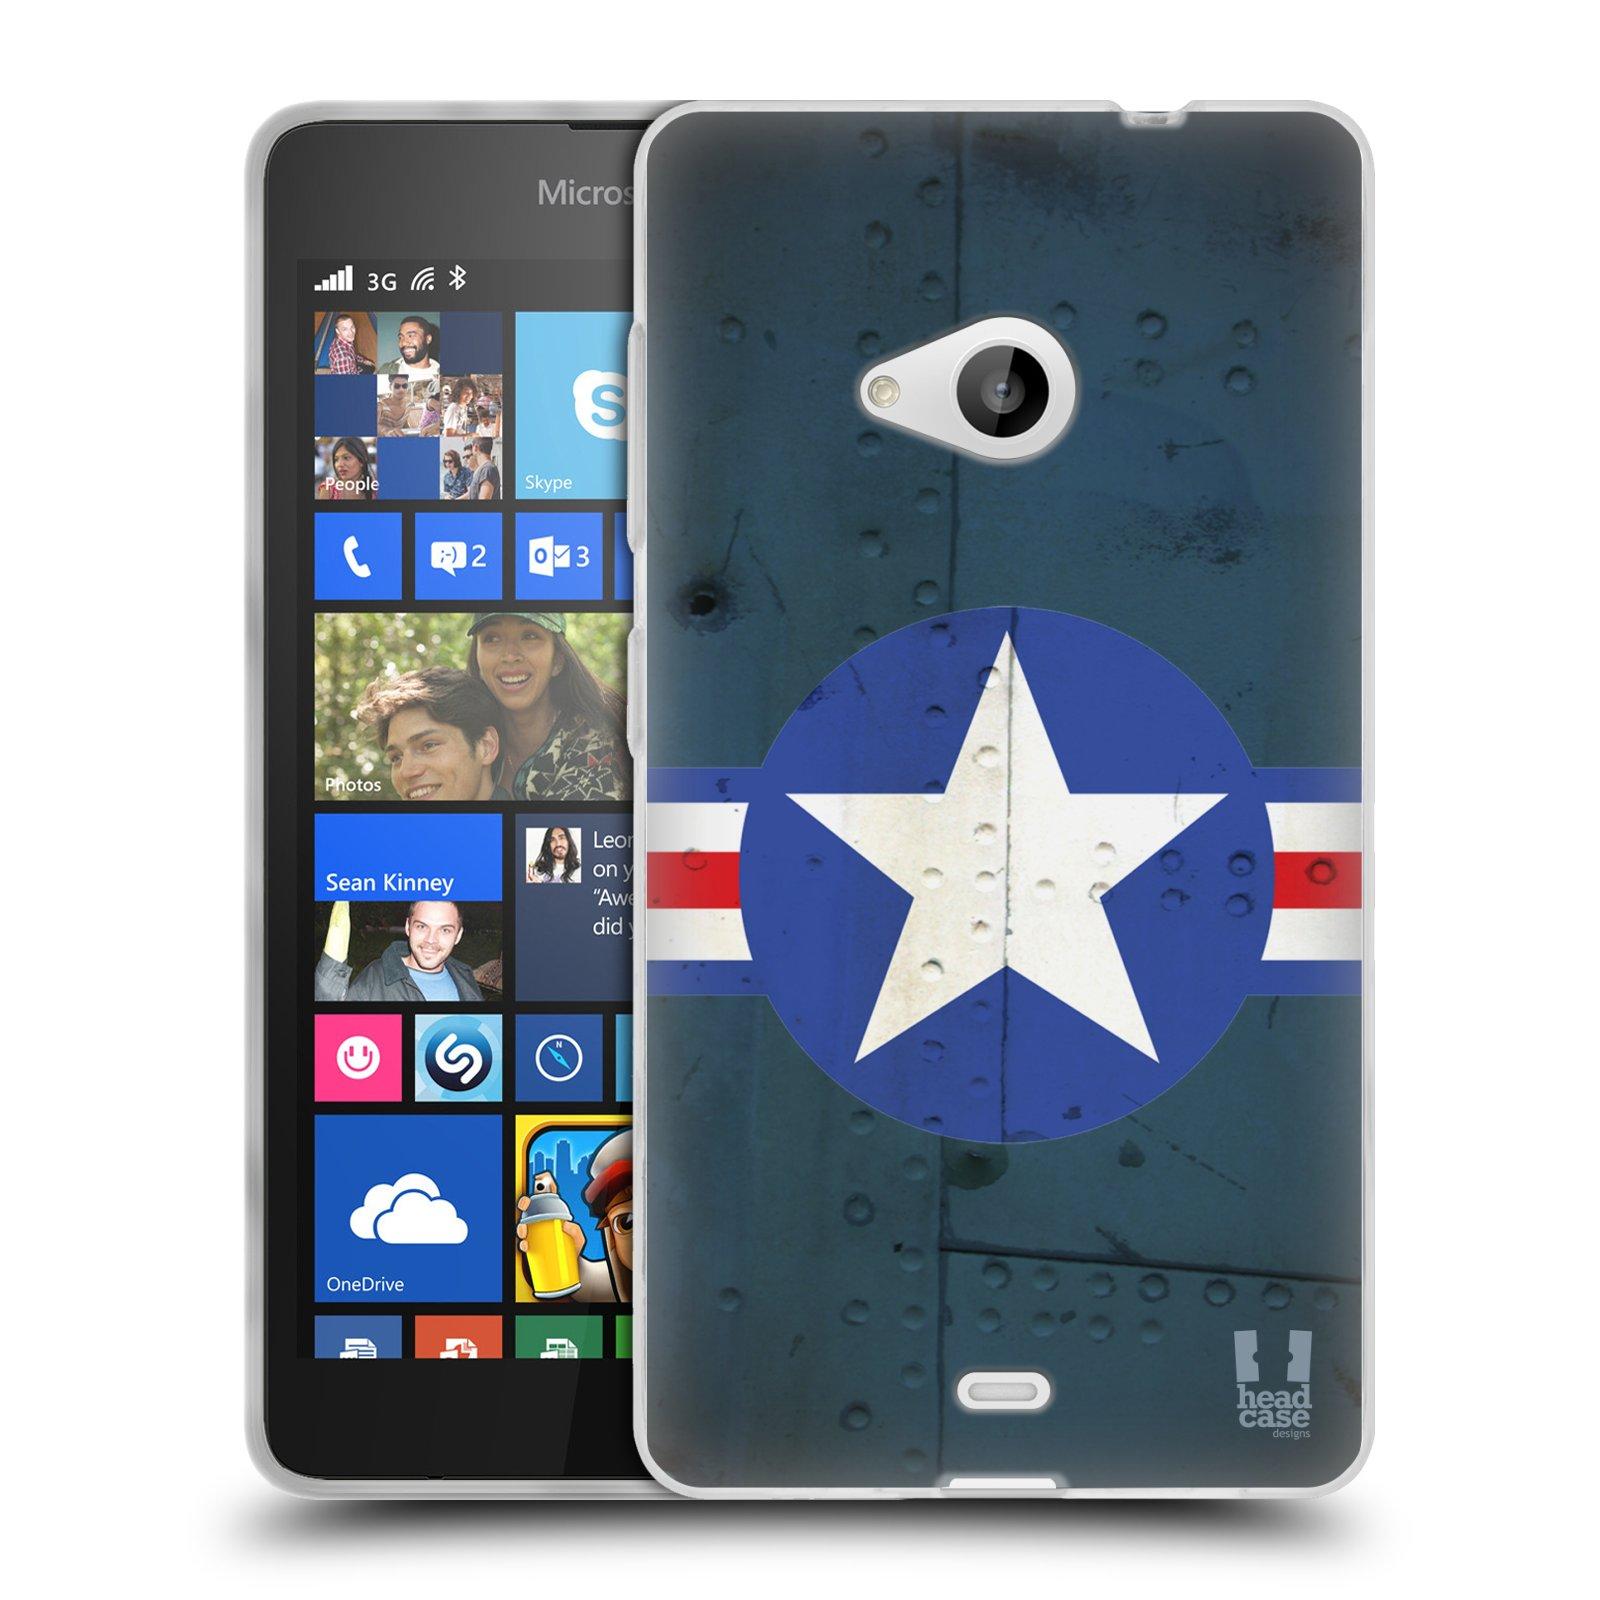 Silikonové pouzdro na mobil Microsoft Lumia 535 HEAD CASE POSTWAR (Silikonový kryt či obal na mobilní telefon Microsoft Lumia 535)